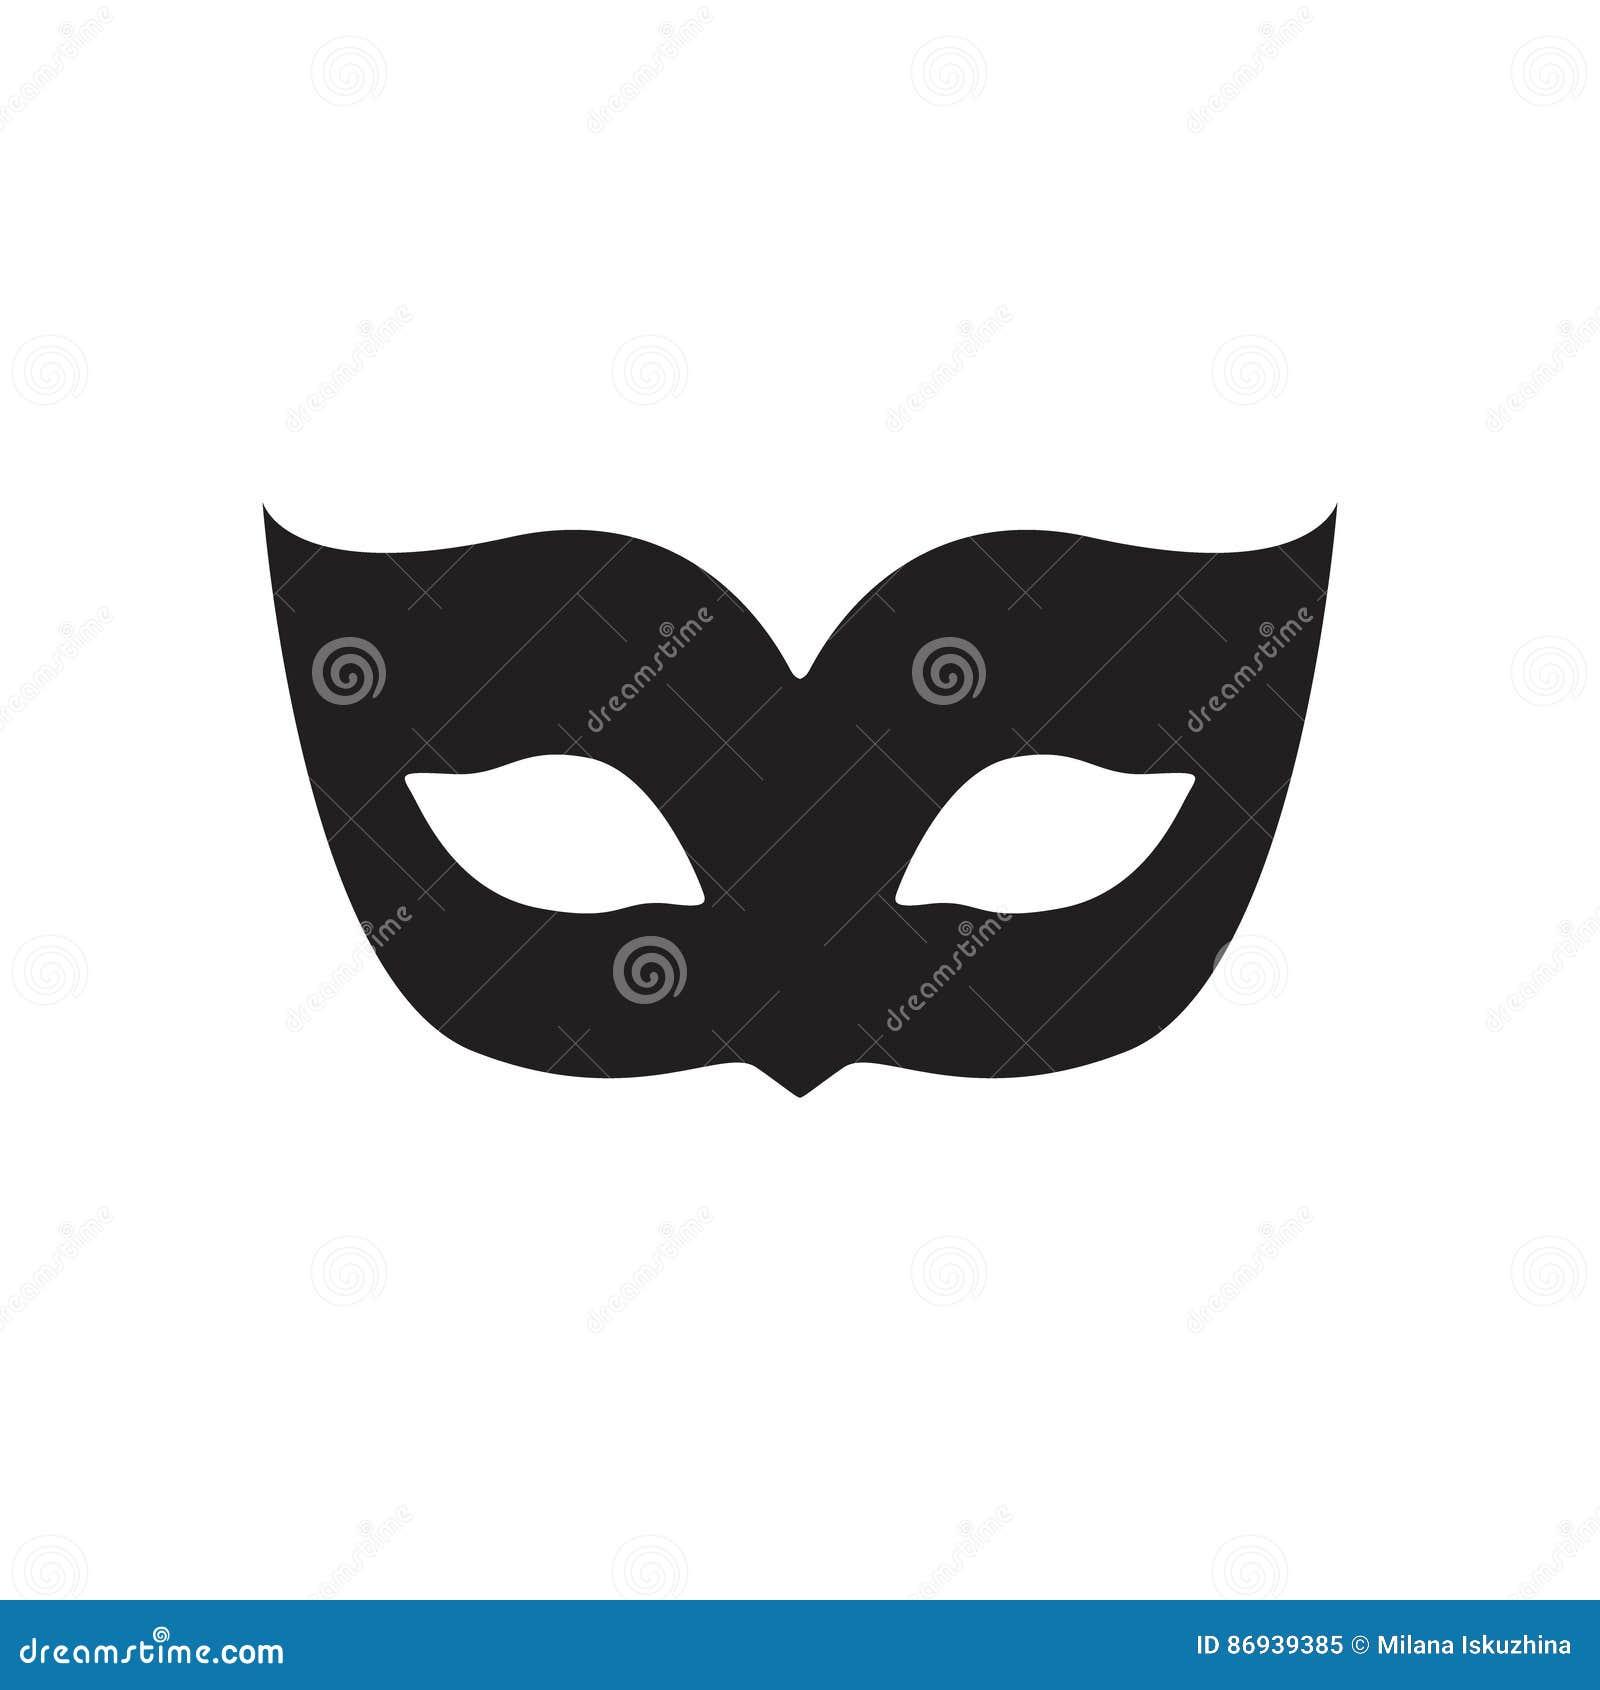 joker mask template - blank carnival mask icon template illustration vector